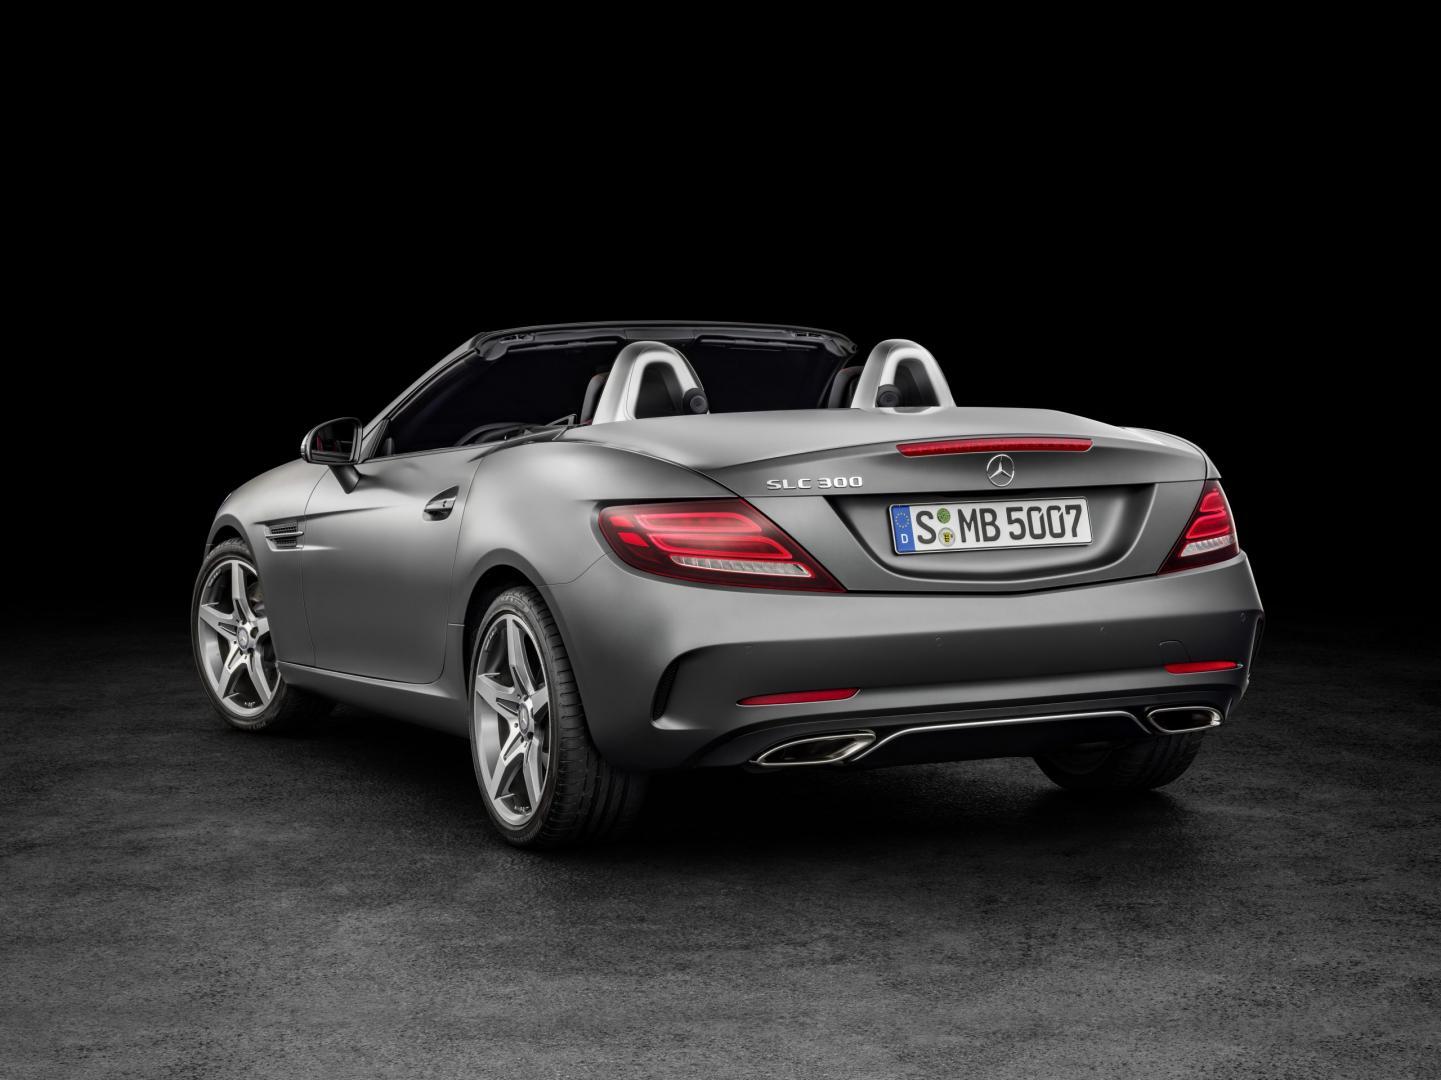 Mercedes SLC 180 (2016)